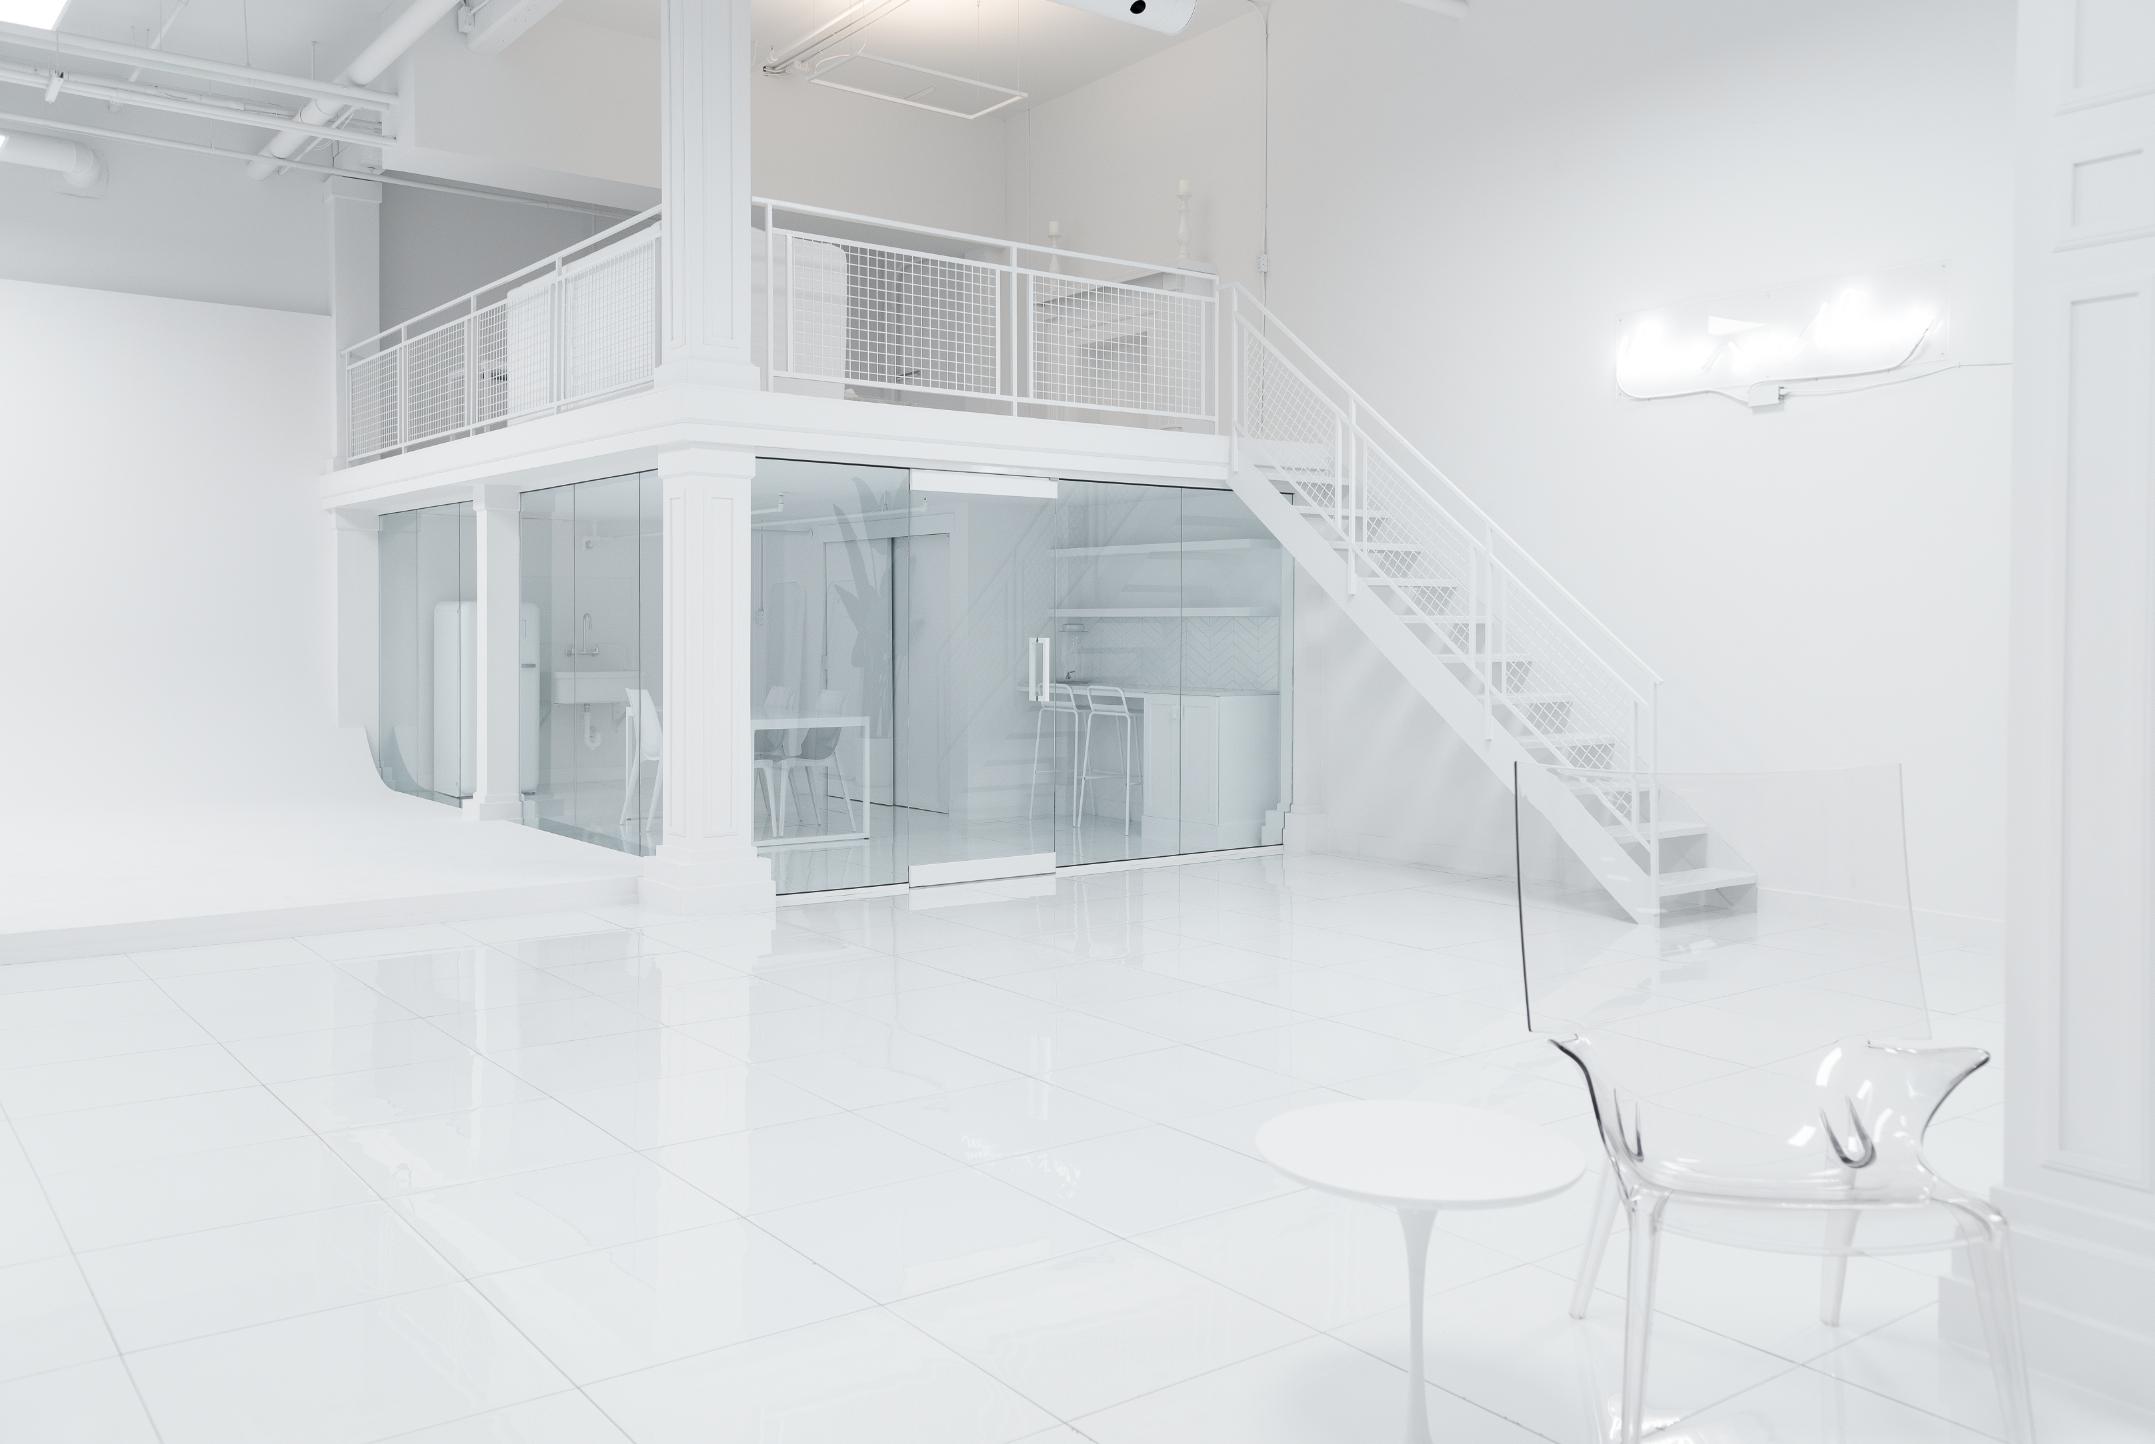 studio-photo-anexcessofwhite-tout-blanc-mezanine.png